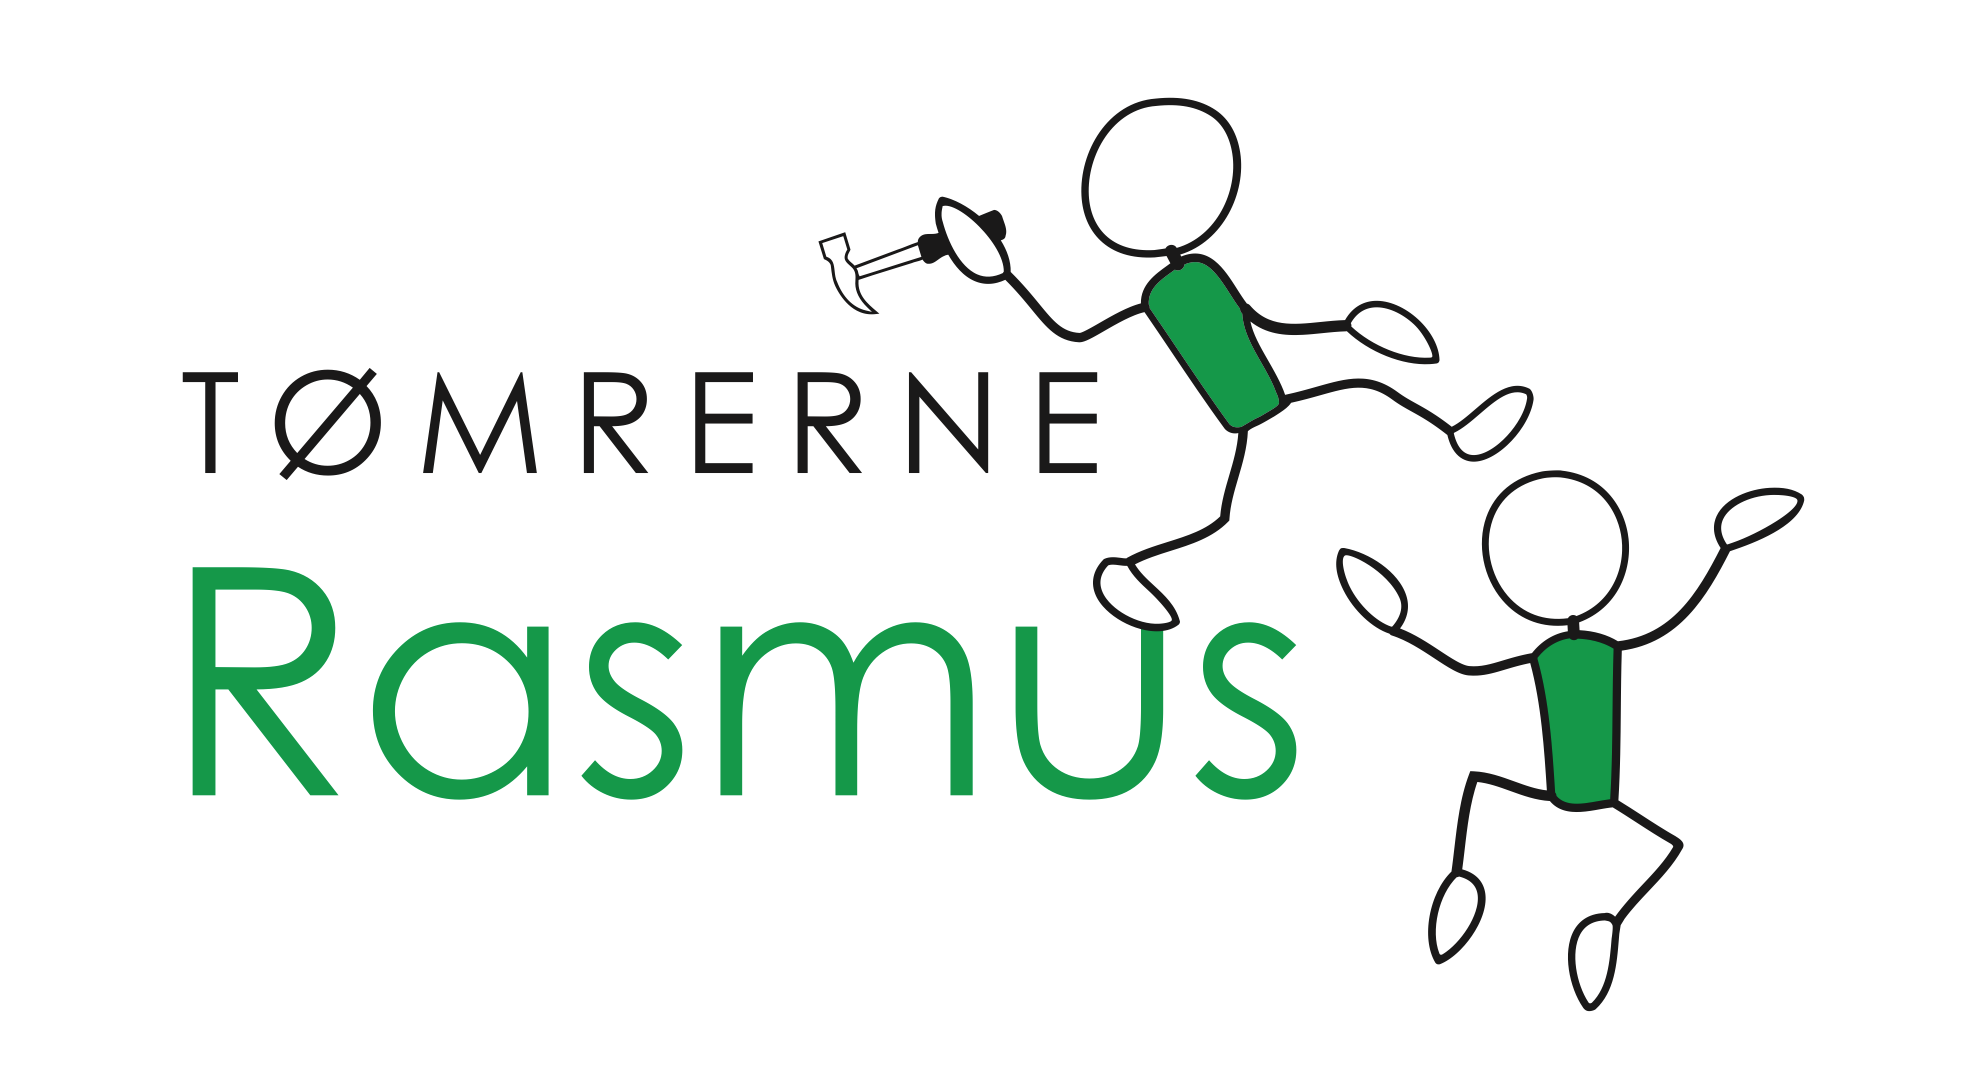 Tømrene Rasmus.png